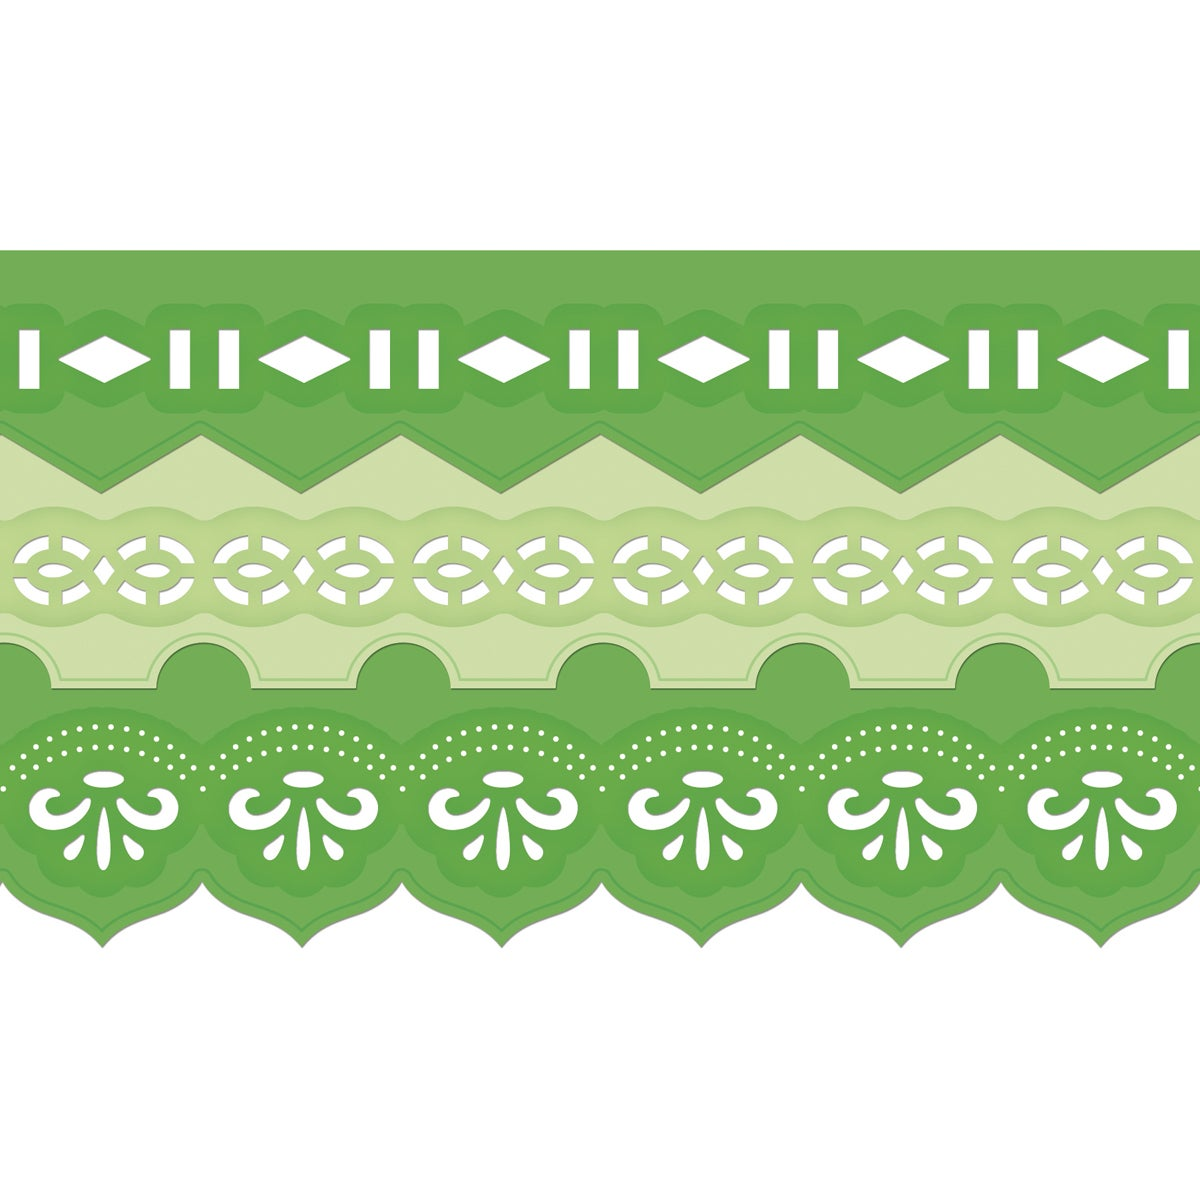 Spellbinders Edgeabilities Dies-Classic Decorative Inserts 2